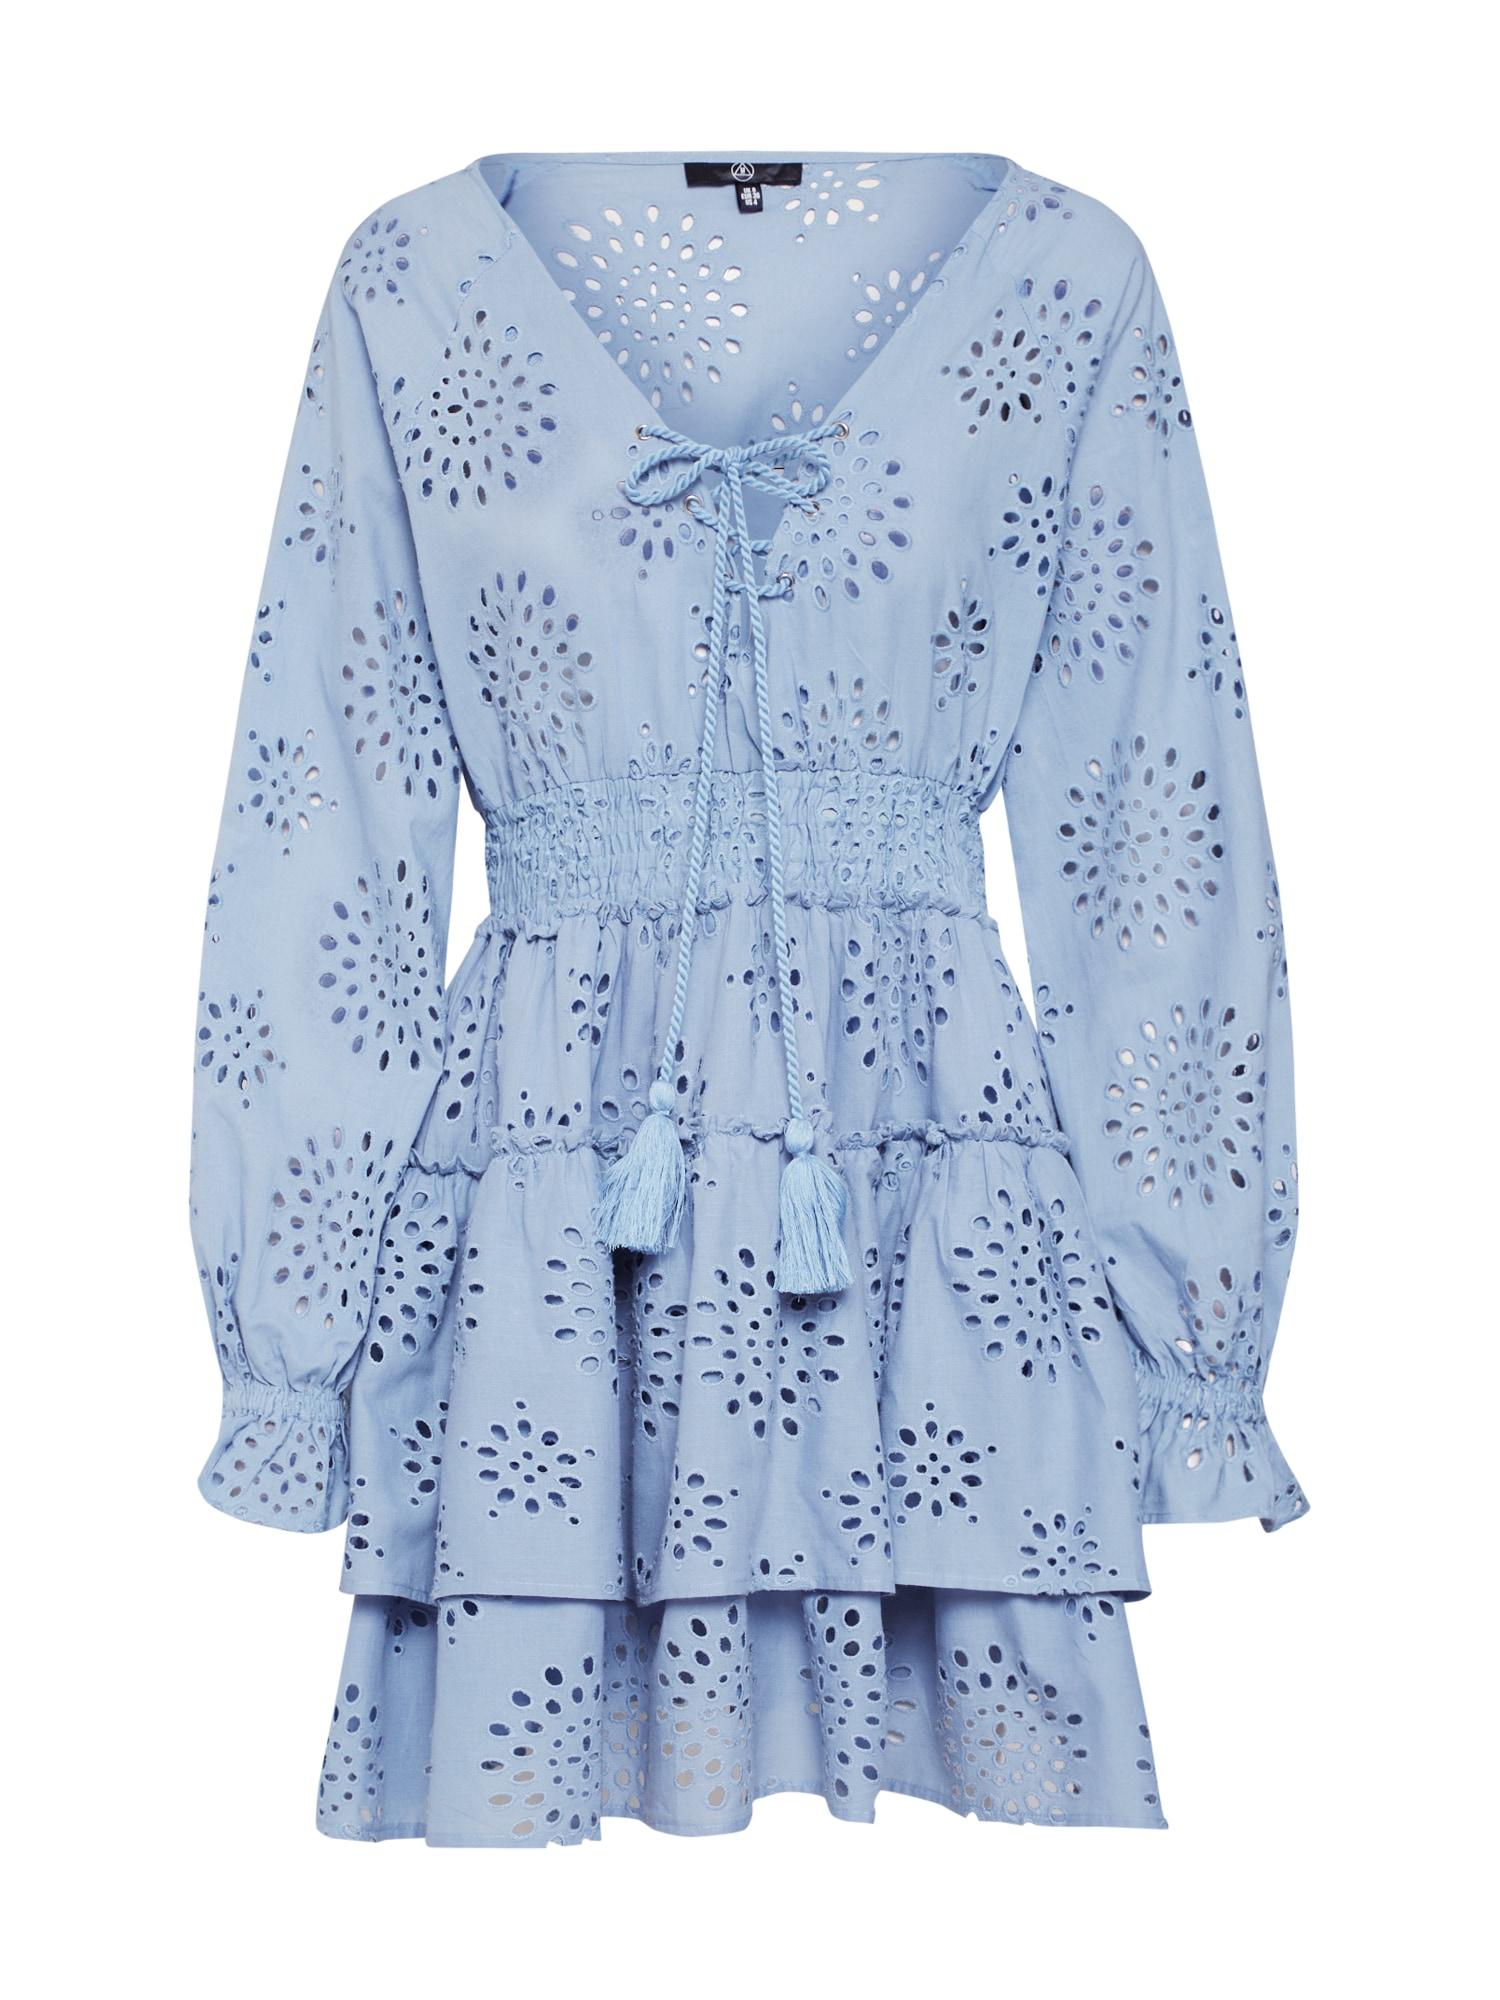 Letní šaty BRODERIE ANGAISE RUFFLE HEM MINI DRESS modrá Missguided